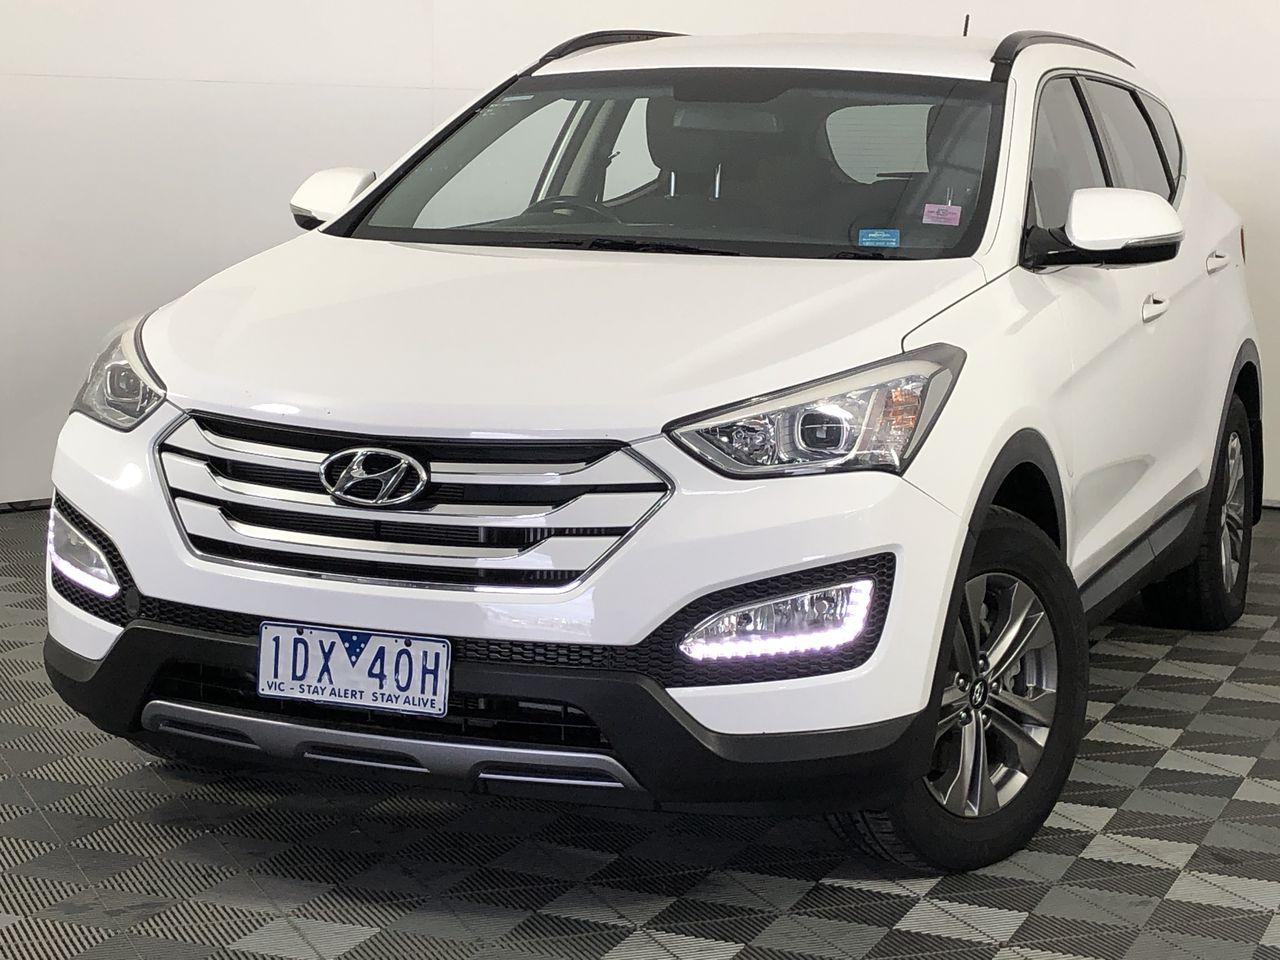 2015 Hyundai Santa Fe Active DM Turbo Diesel Automatic 7 Seats Wagon